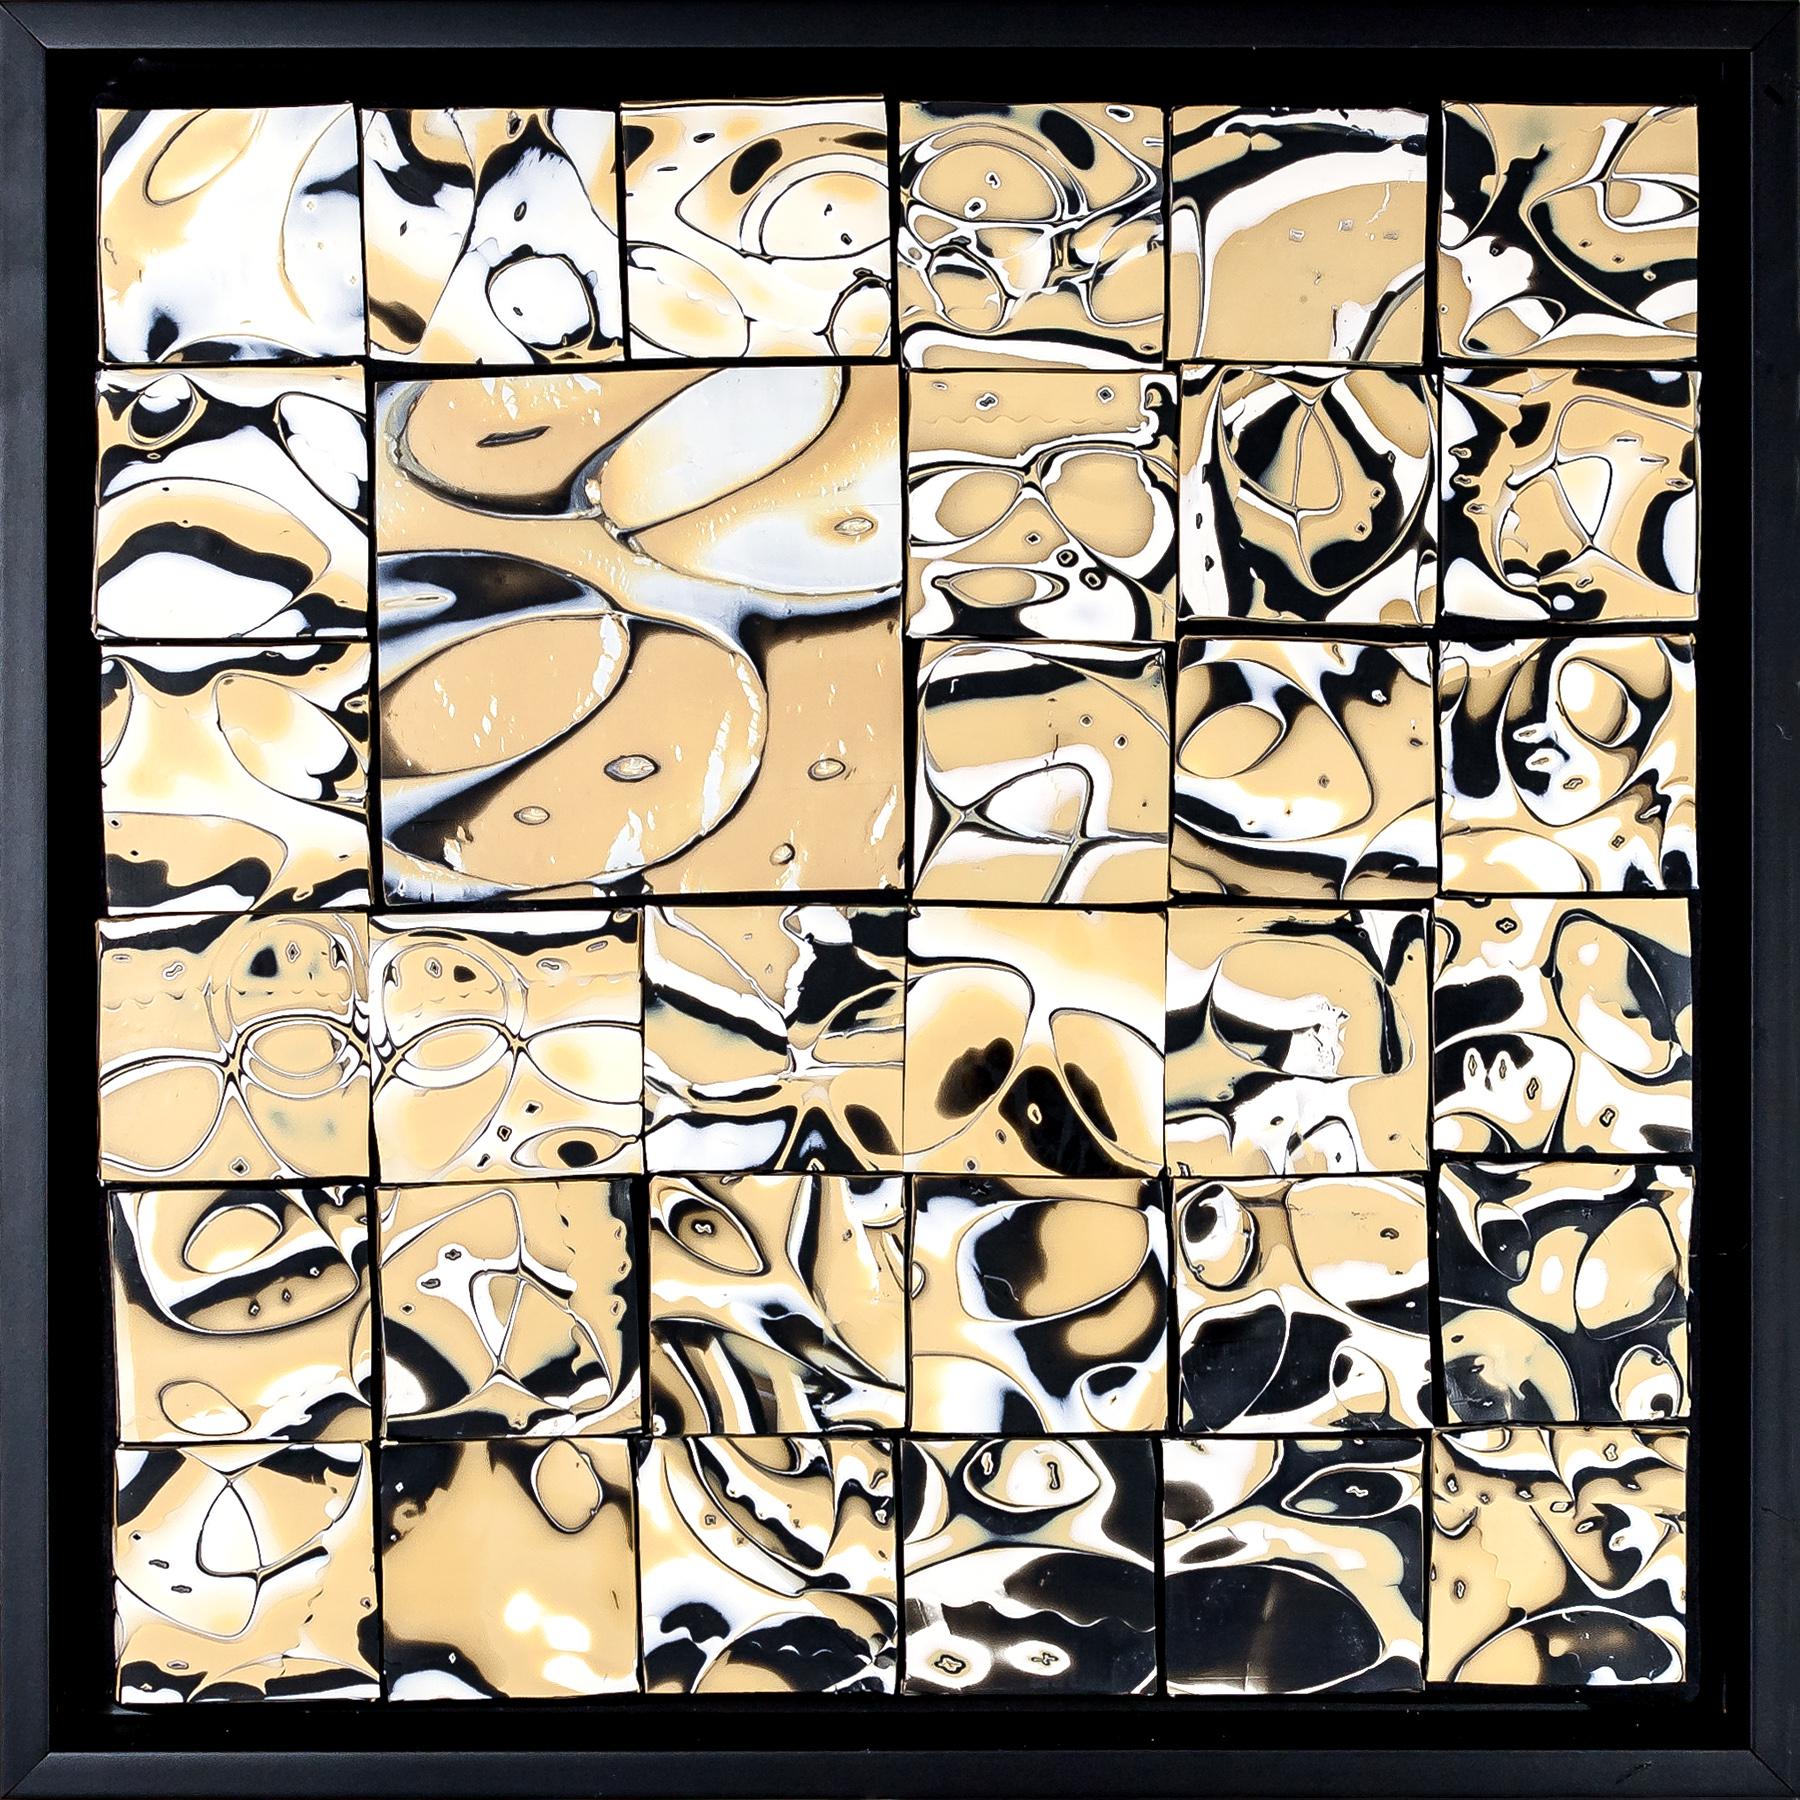 Foundry Gallery-Fran Abrams-Circular Logic 12x12 Polymer clay not painted-2017-$600.jpg